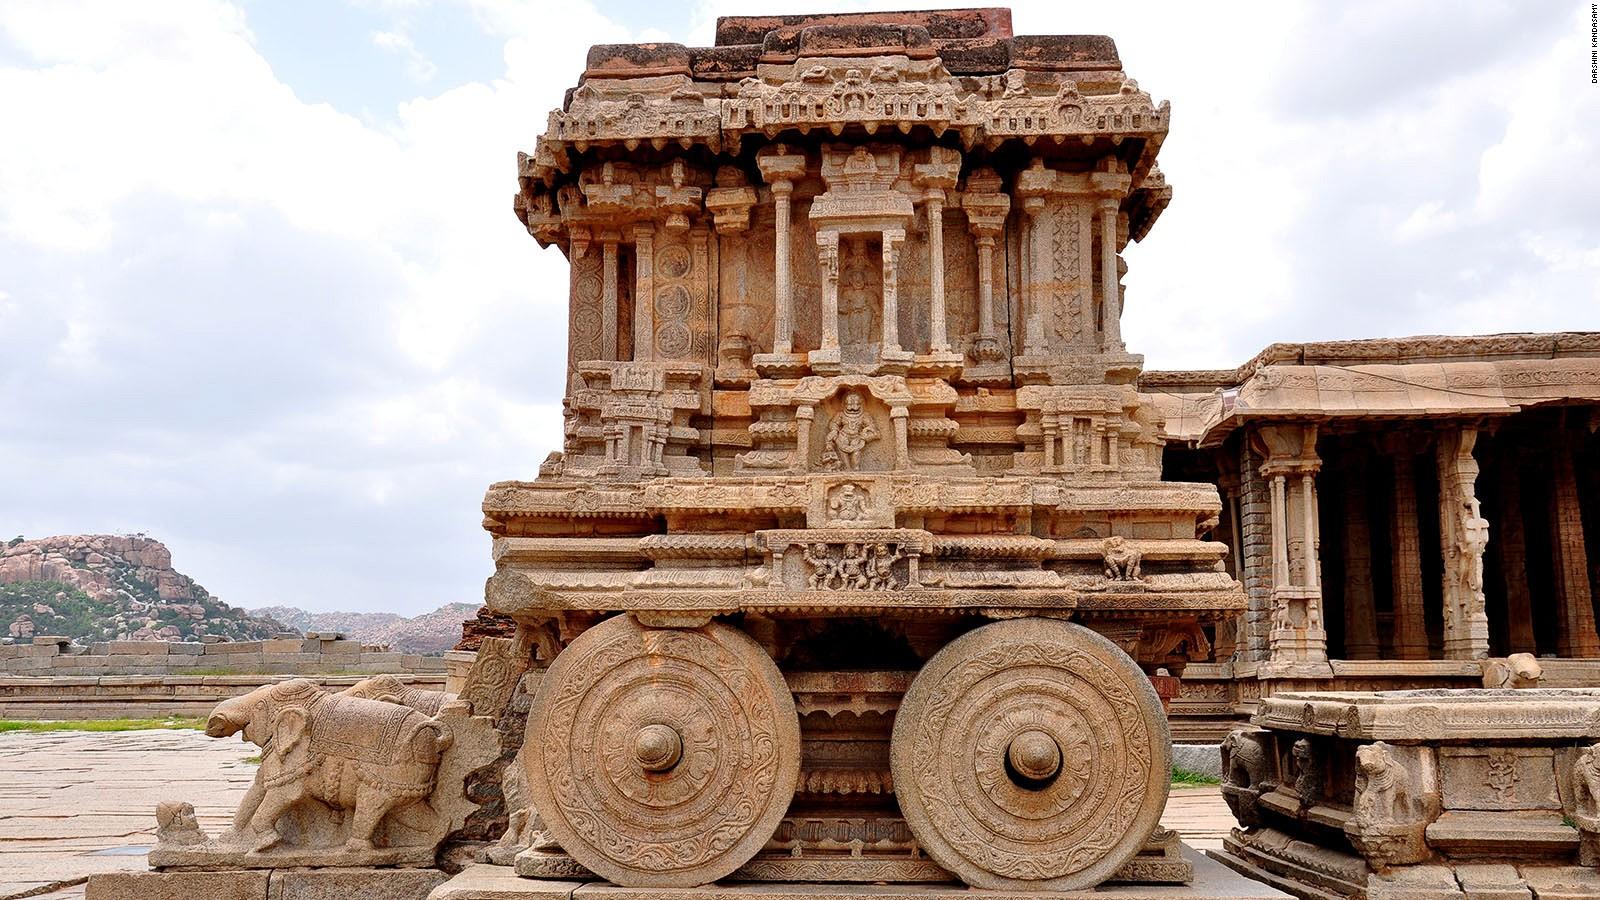 Hampi, India: Ancient city of gods, kings and ruins | CNN Travel